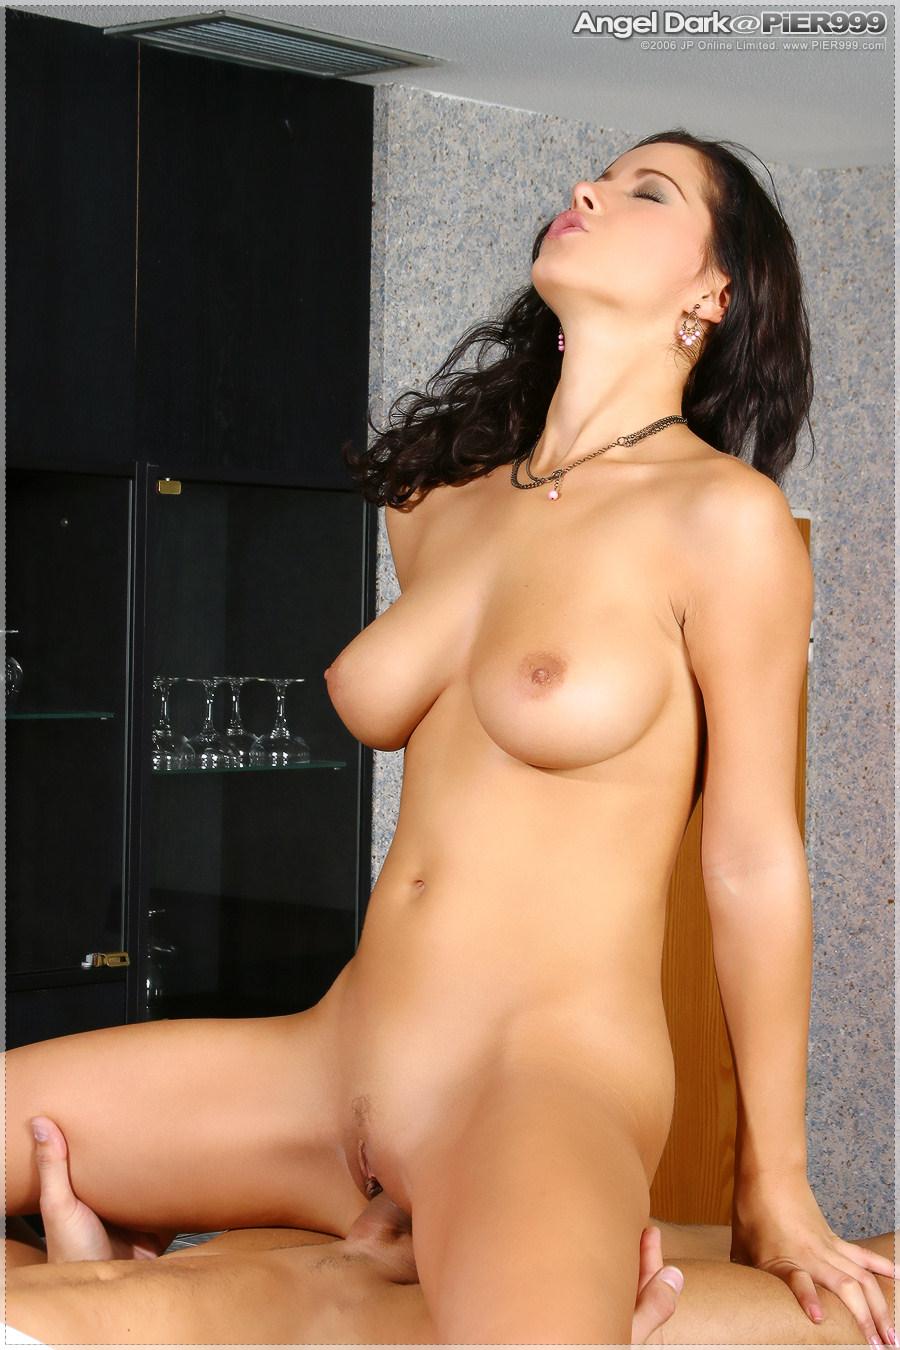 Angel Dark Porn Pics angel dark nude - 712 pictures: rating 9.82/10